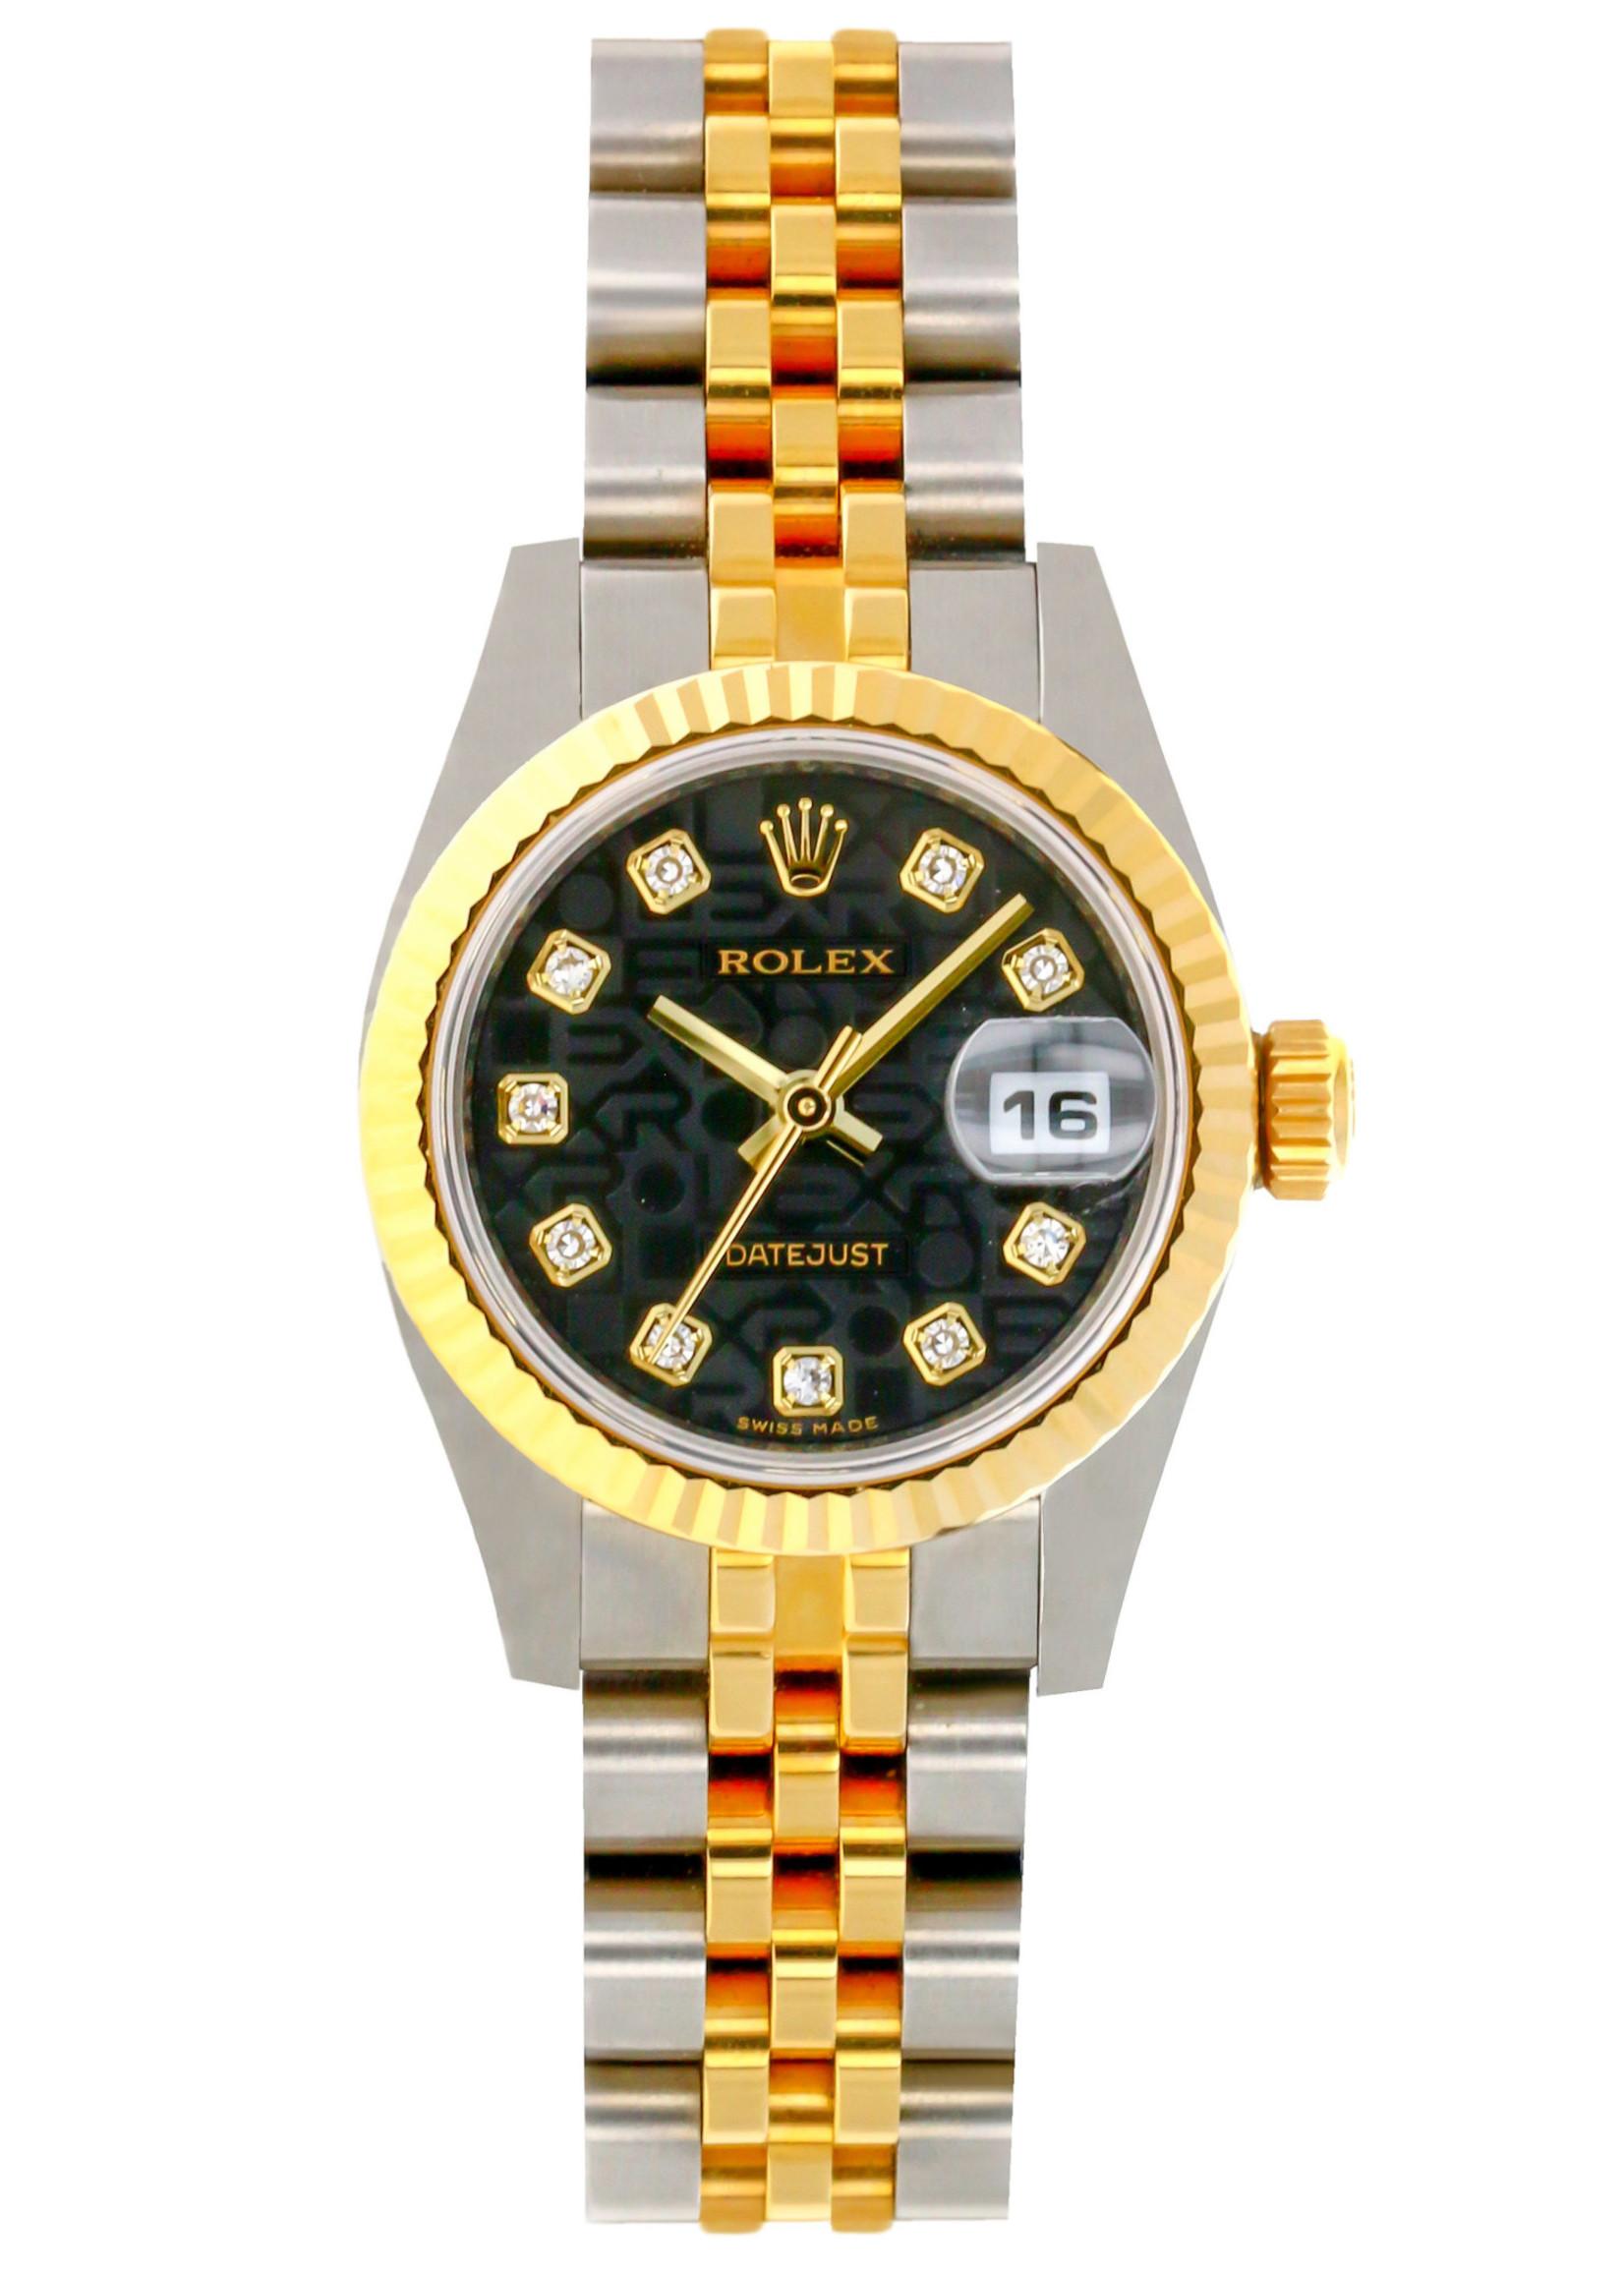 Rolex ROLEX DATEJUST 26MM #179173 (2007 B+P)